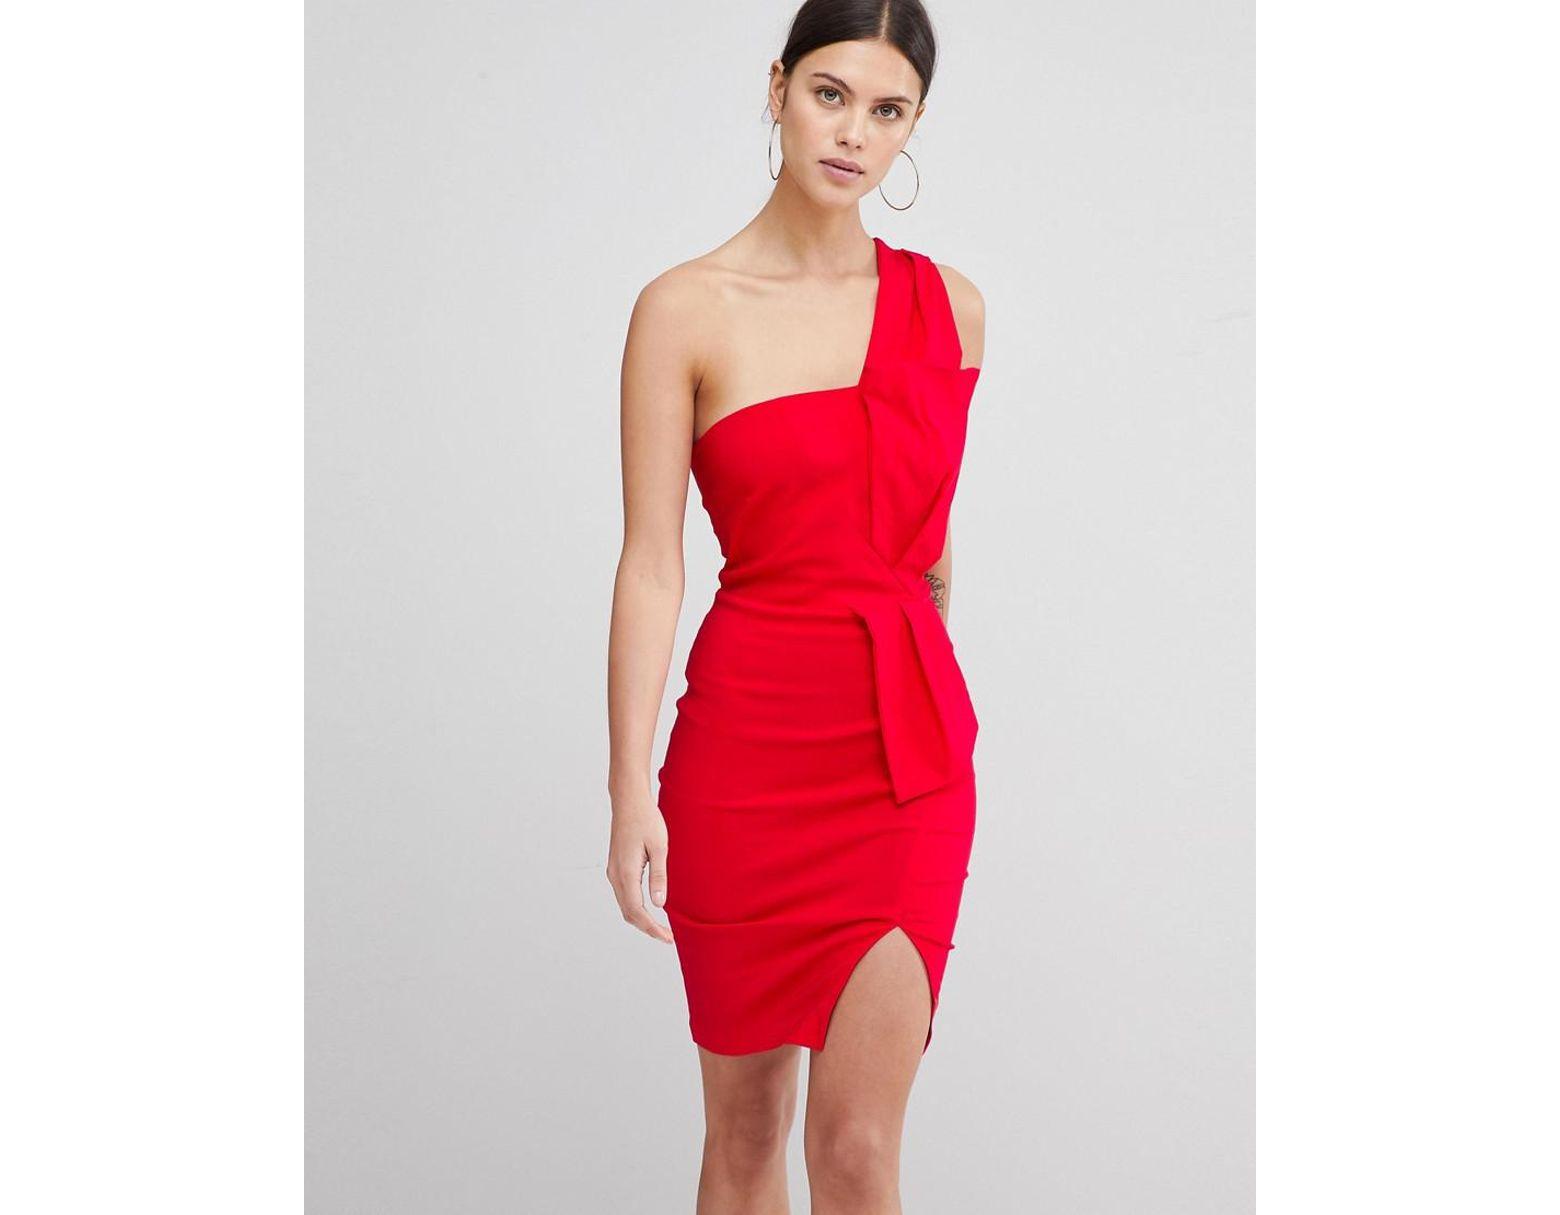 b5d1a7d31f96 Vesper One Shoulder Split Pencil Dress in Red - Lyst